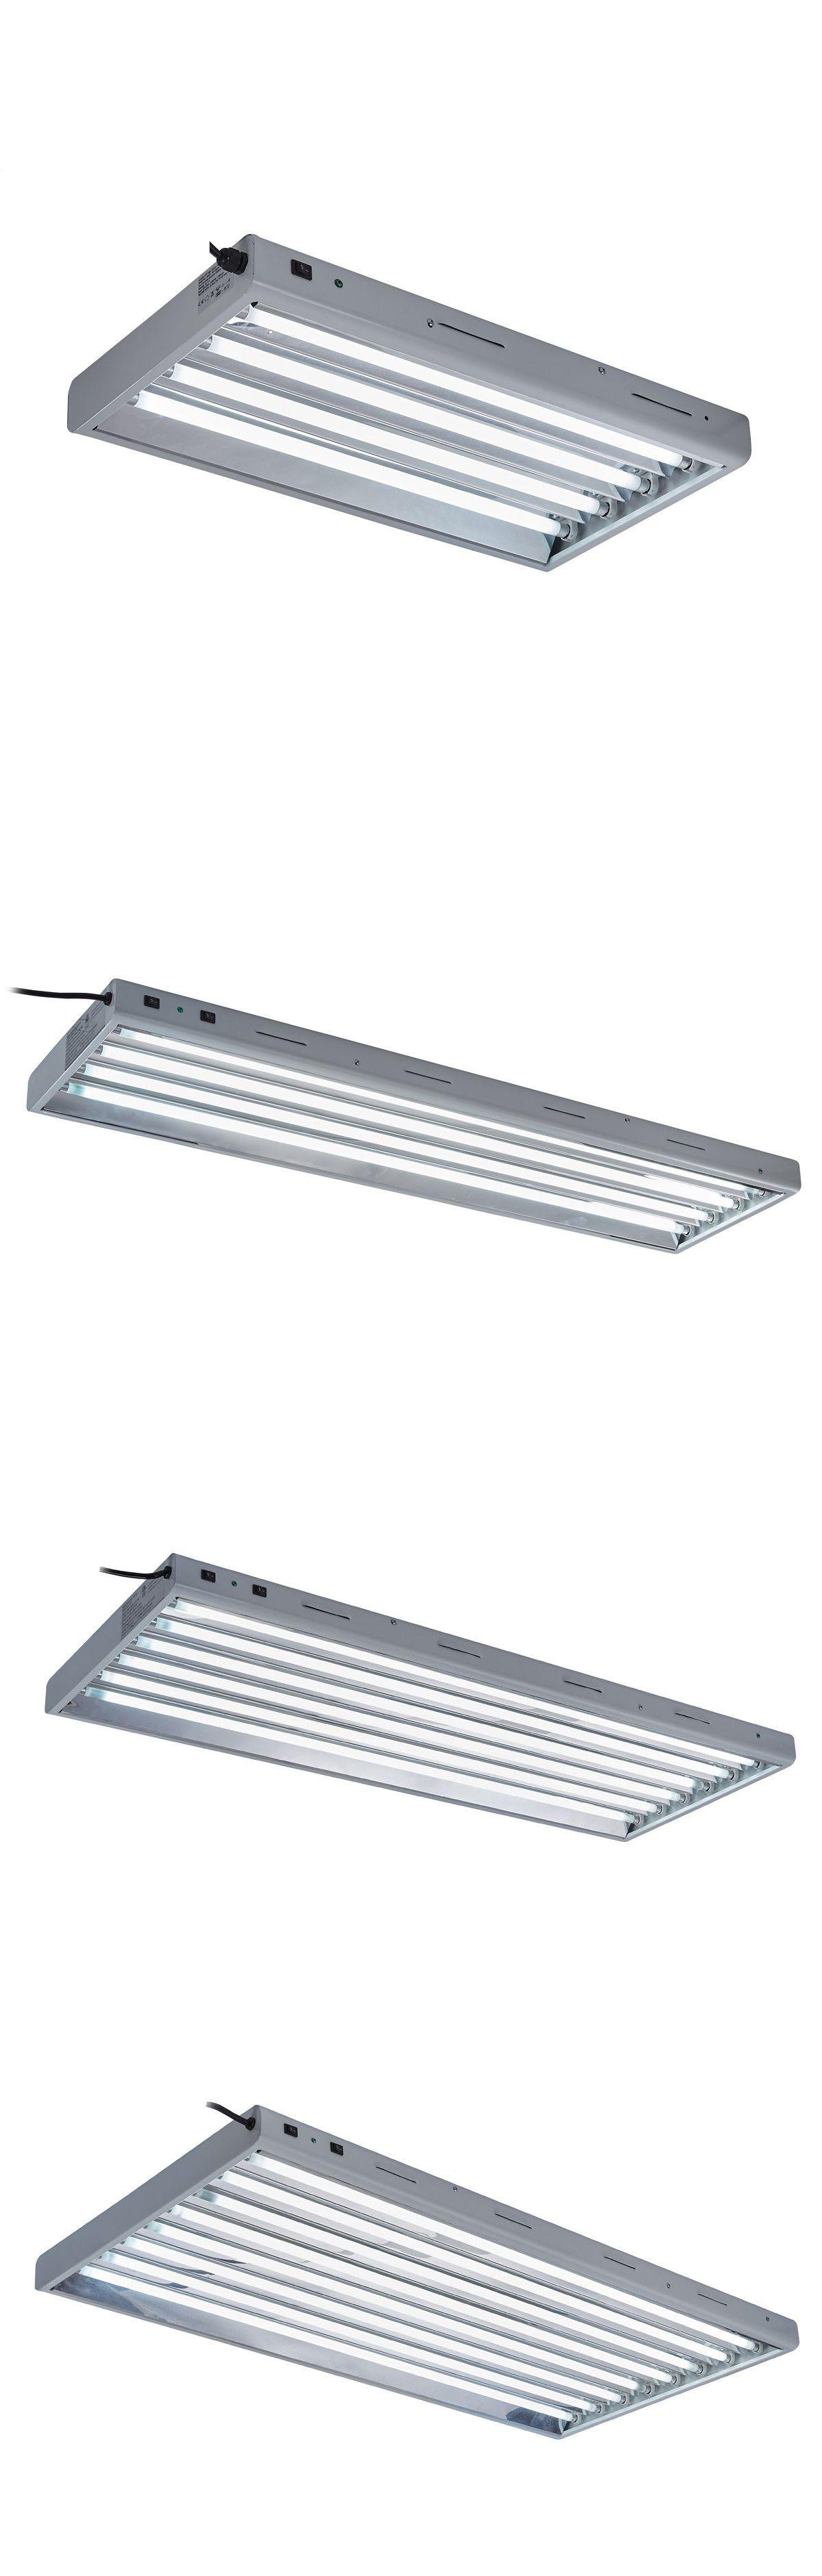 Grow Light Kits 178989 Topogrow T5 2ft 4ft Grow Light Fluorescent Lighting System W 6500k 2700k Tubes Buy It Now Only 6 Grow Light Kits 178989 Light